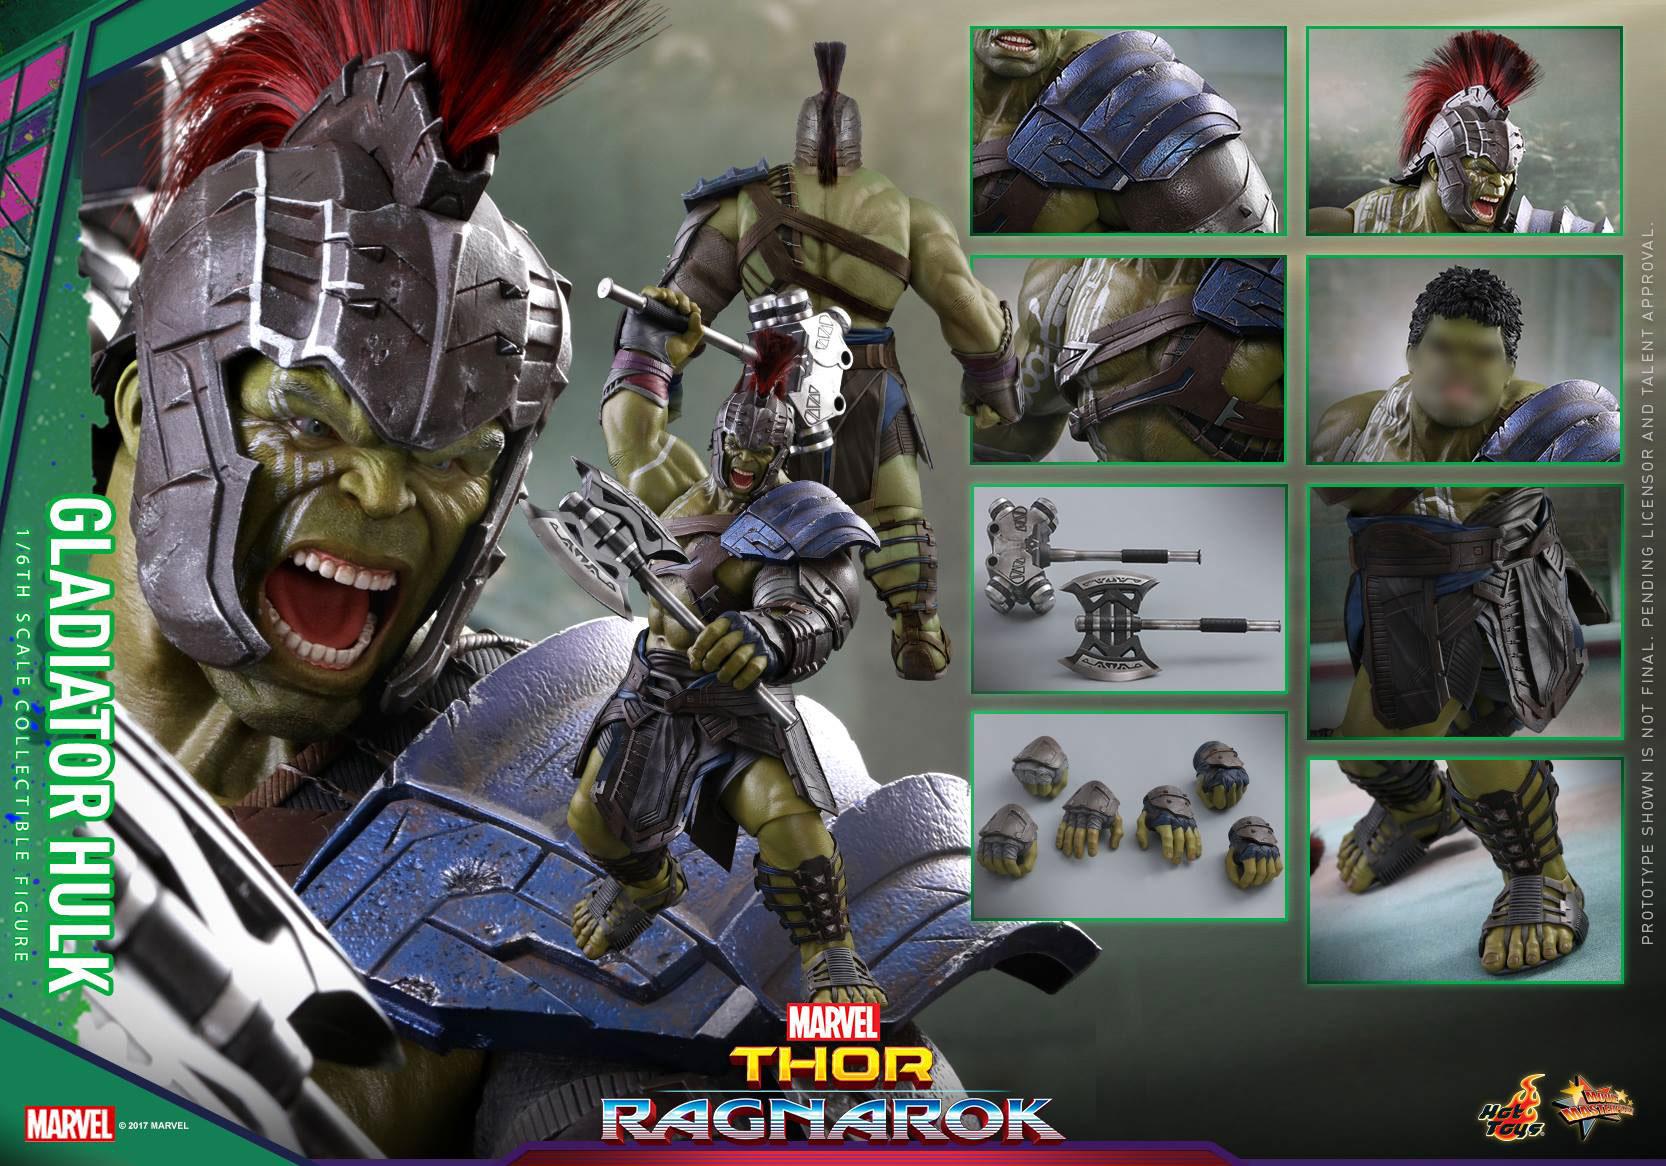 thor-ragnarok-gladiator-hulk-hot-toys-figure-1